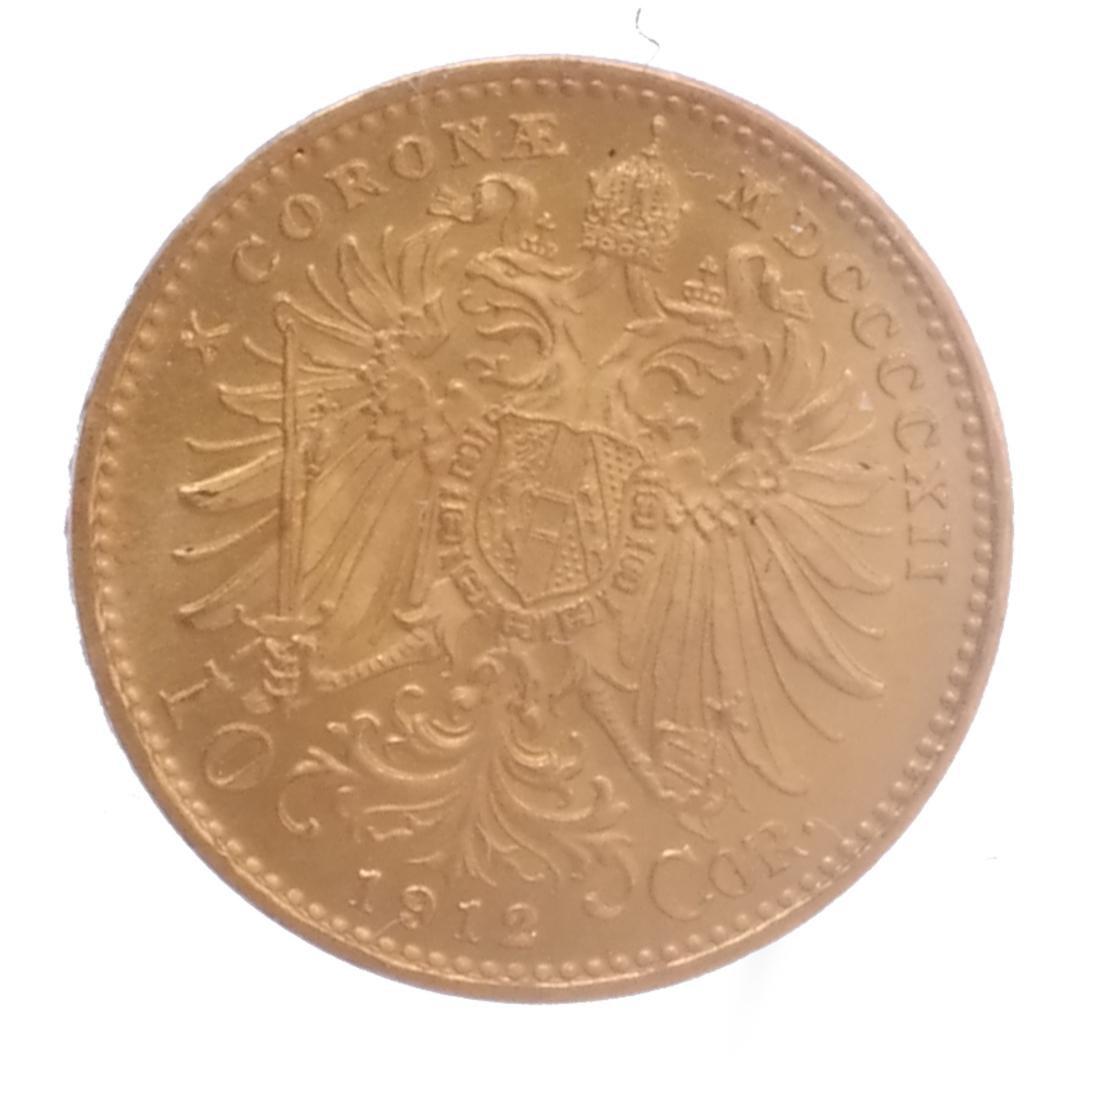 2 Gold, 10 Corona Austria, 1 Australia - 5